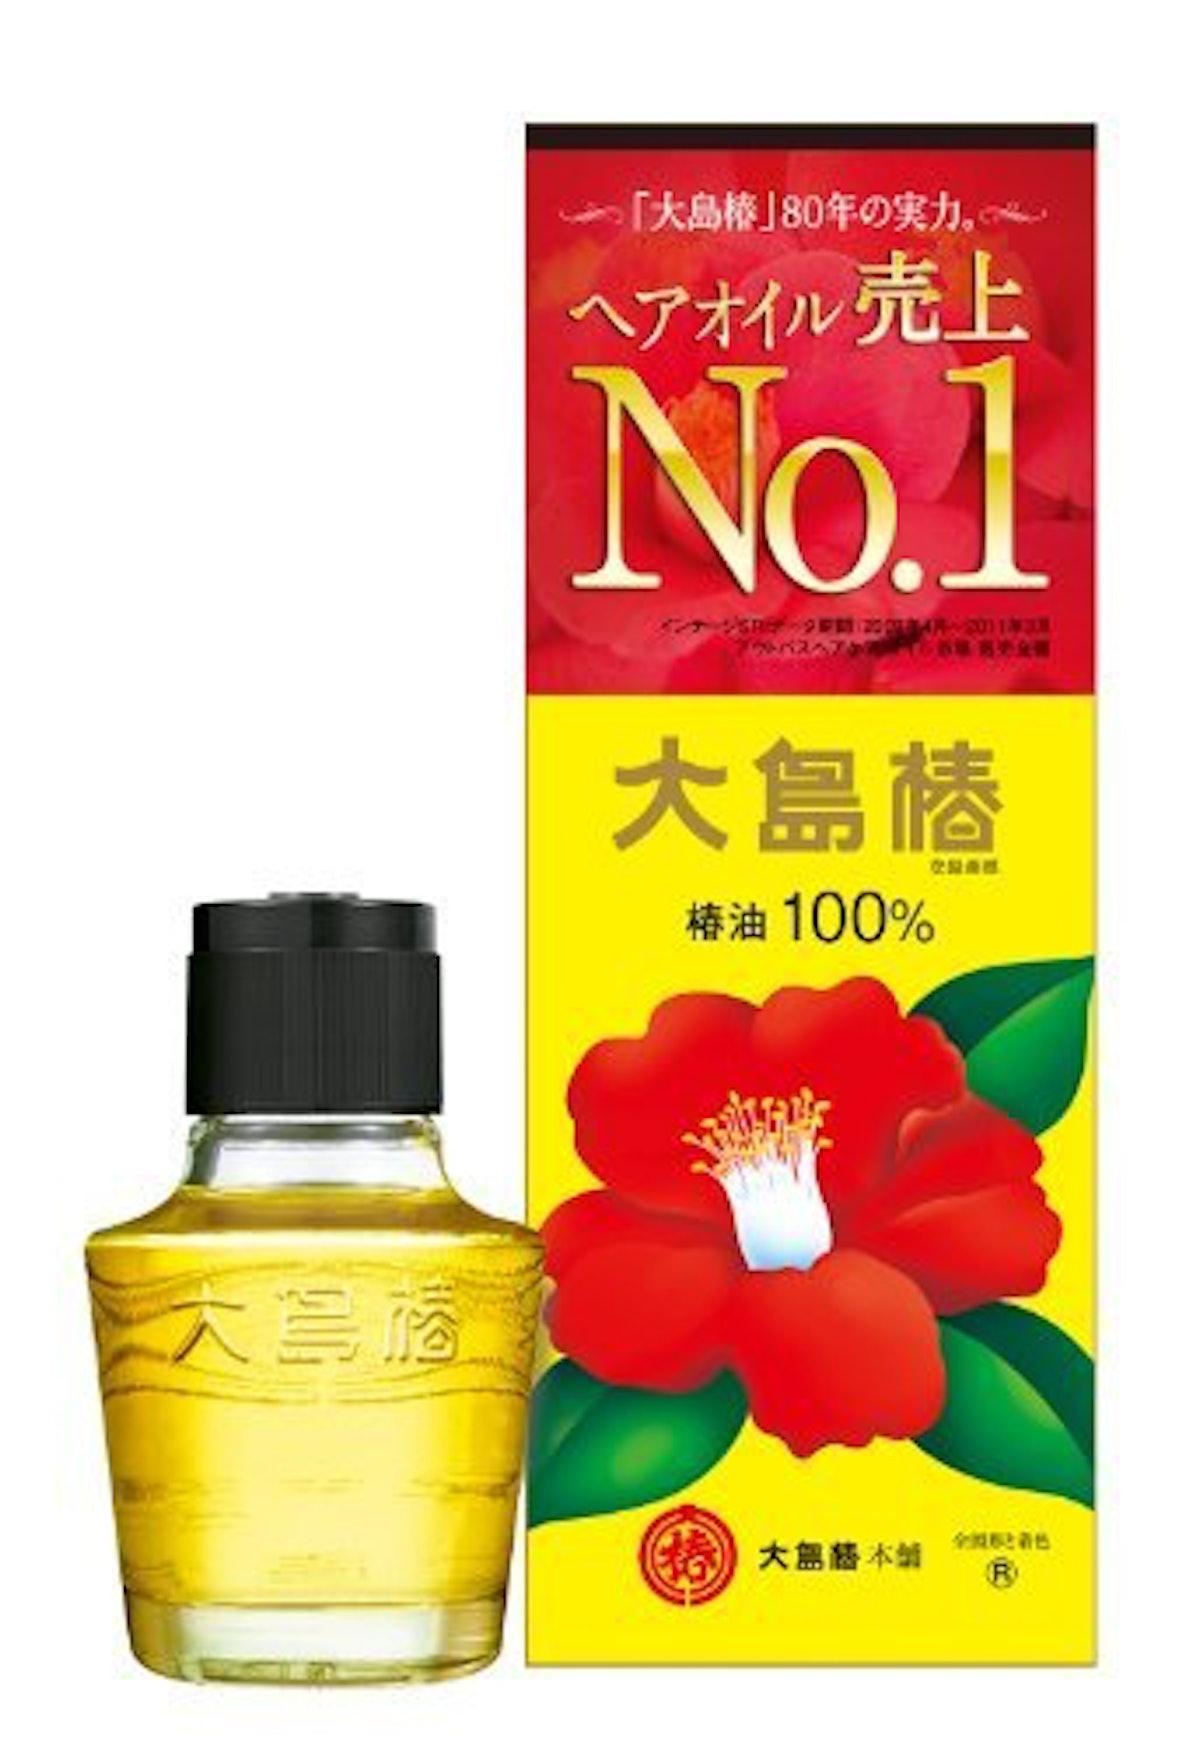 Oshima Tsubaki Camellia Hair Care Oil